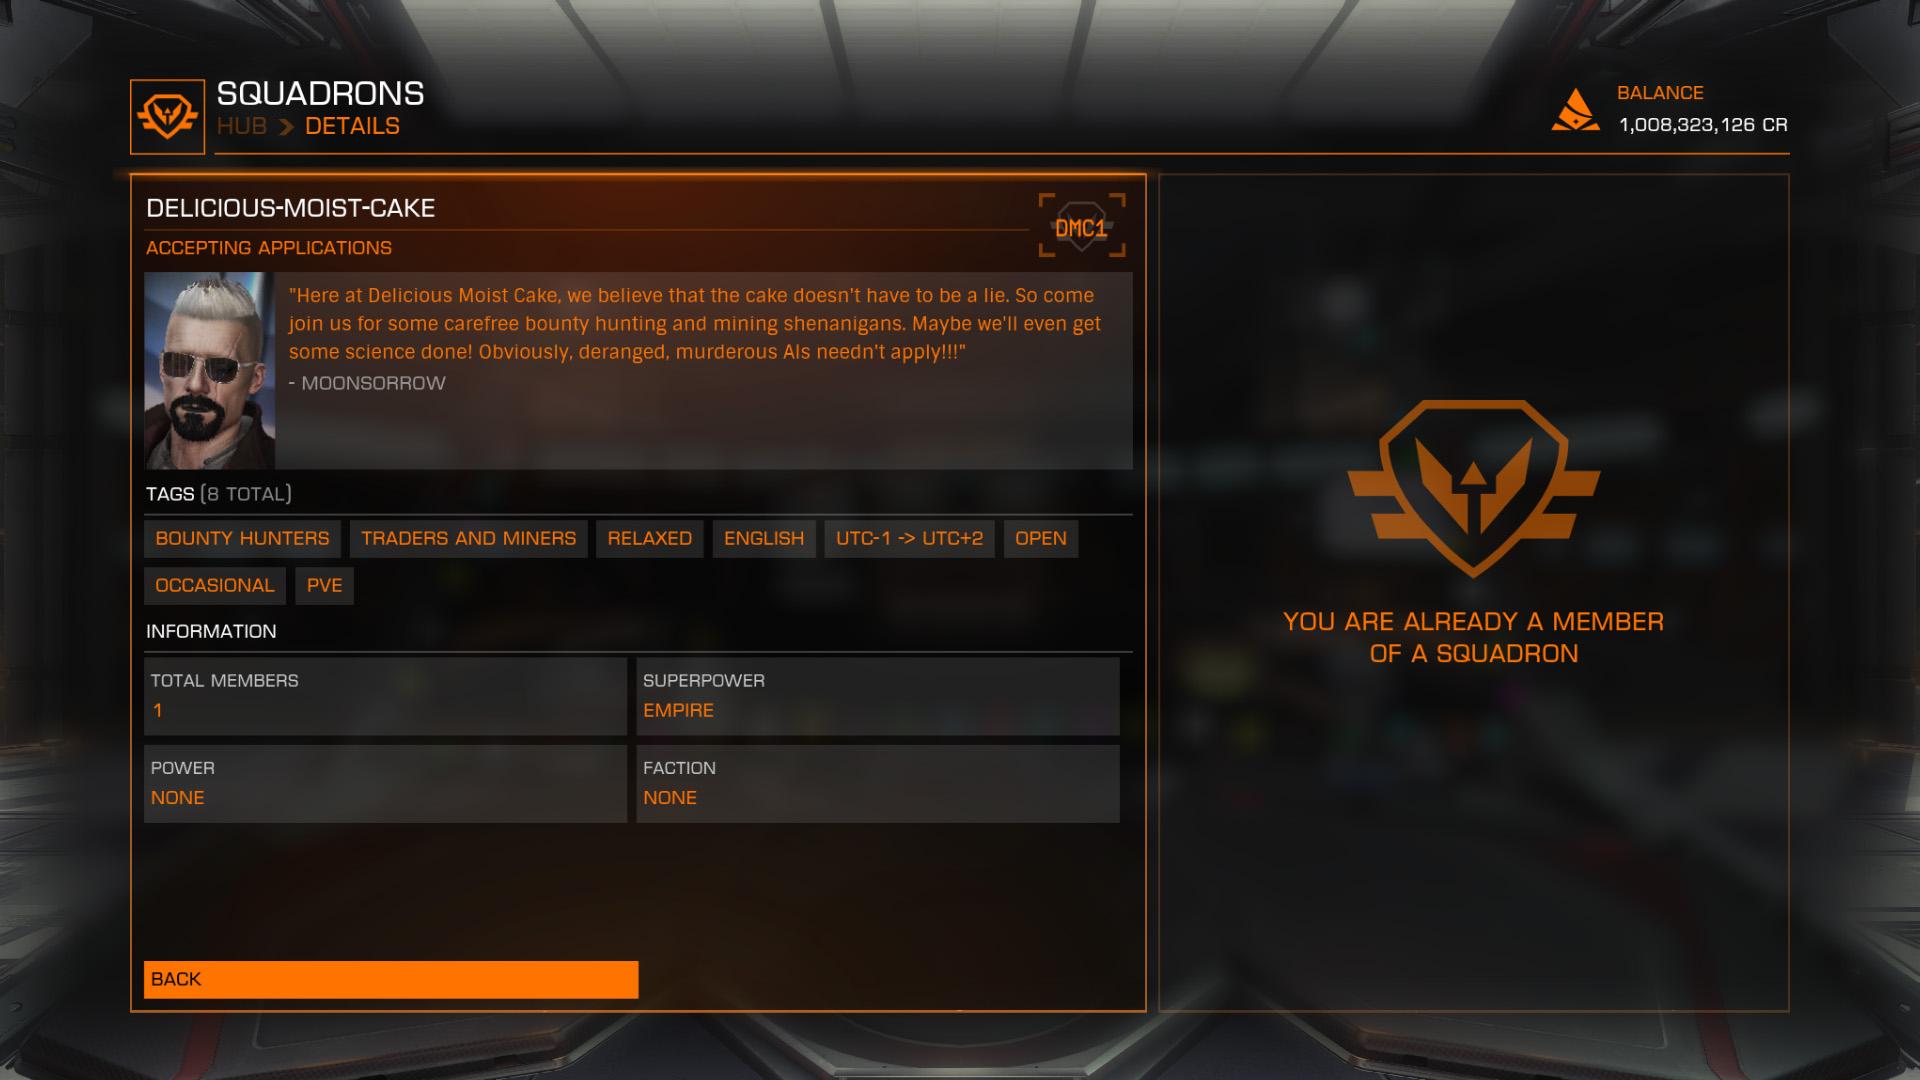 Public facing Squadron page.